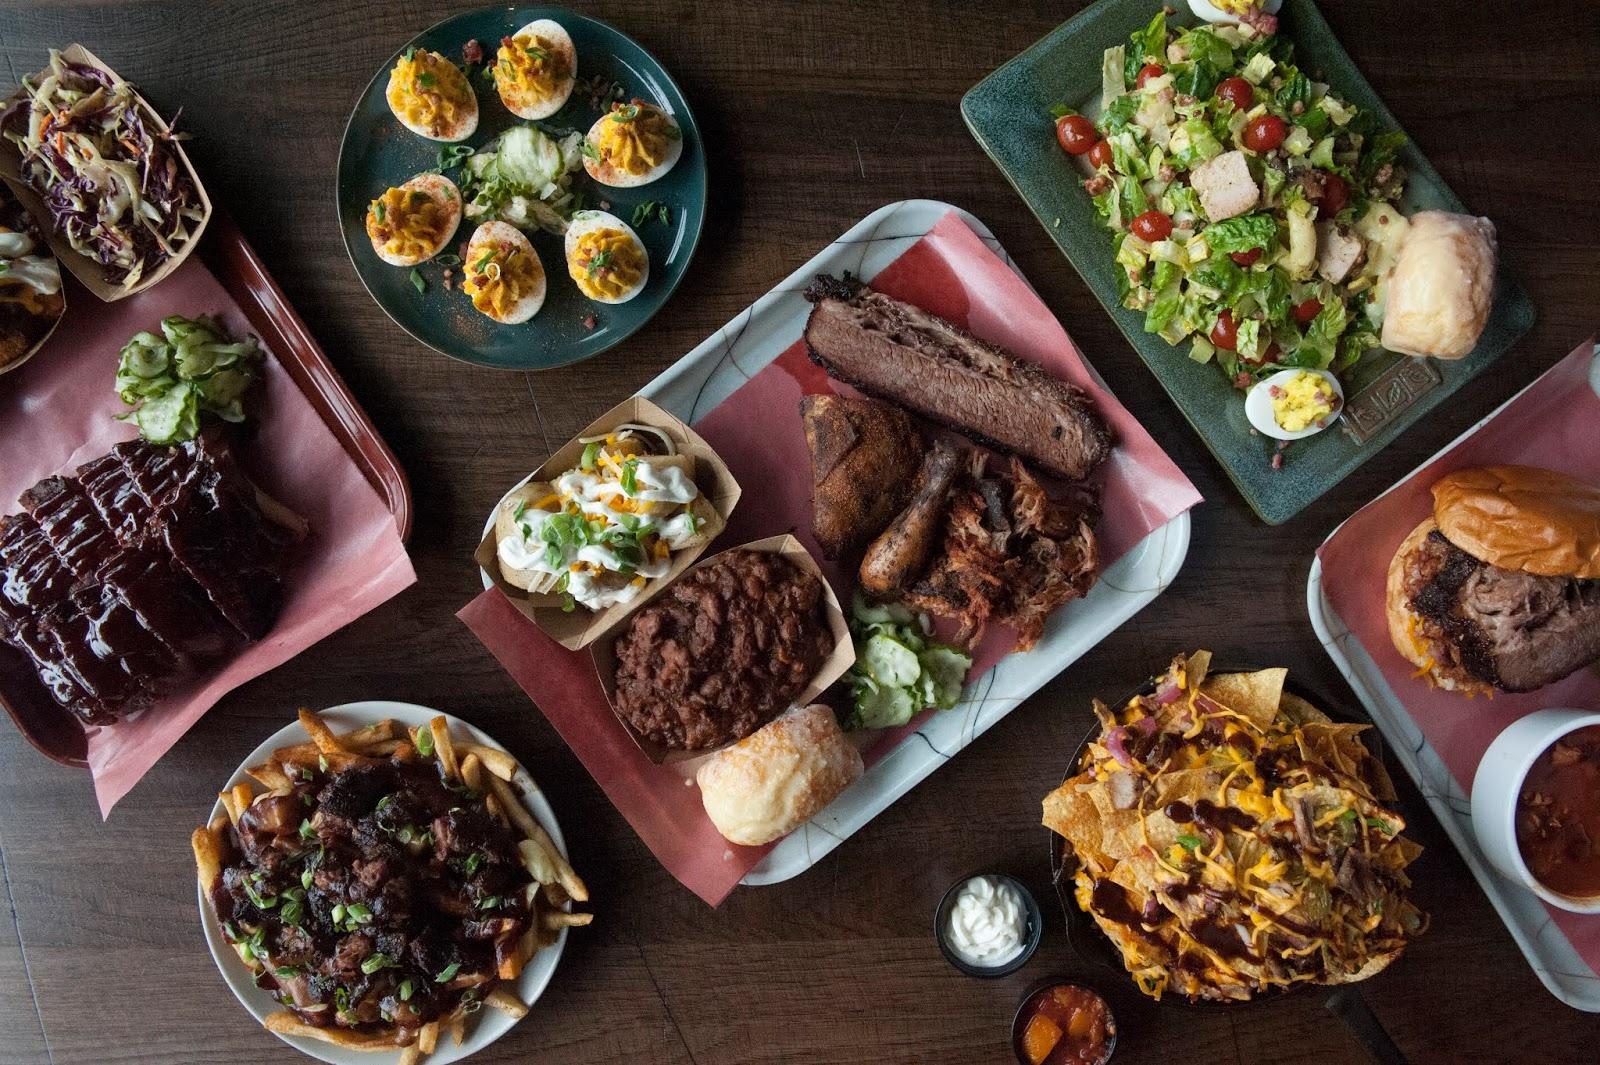 Drool-worthy eats at Skinny's Smoke House